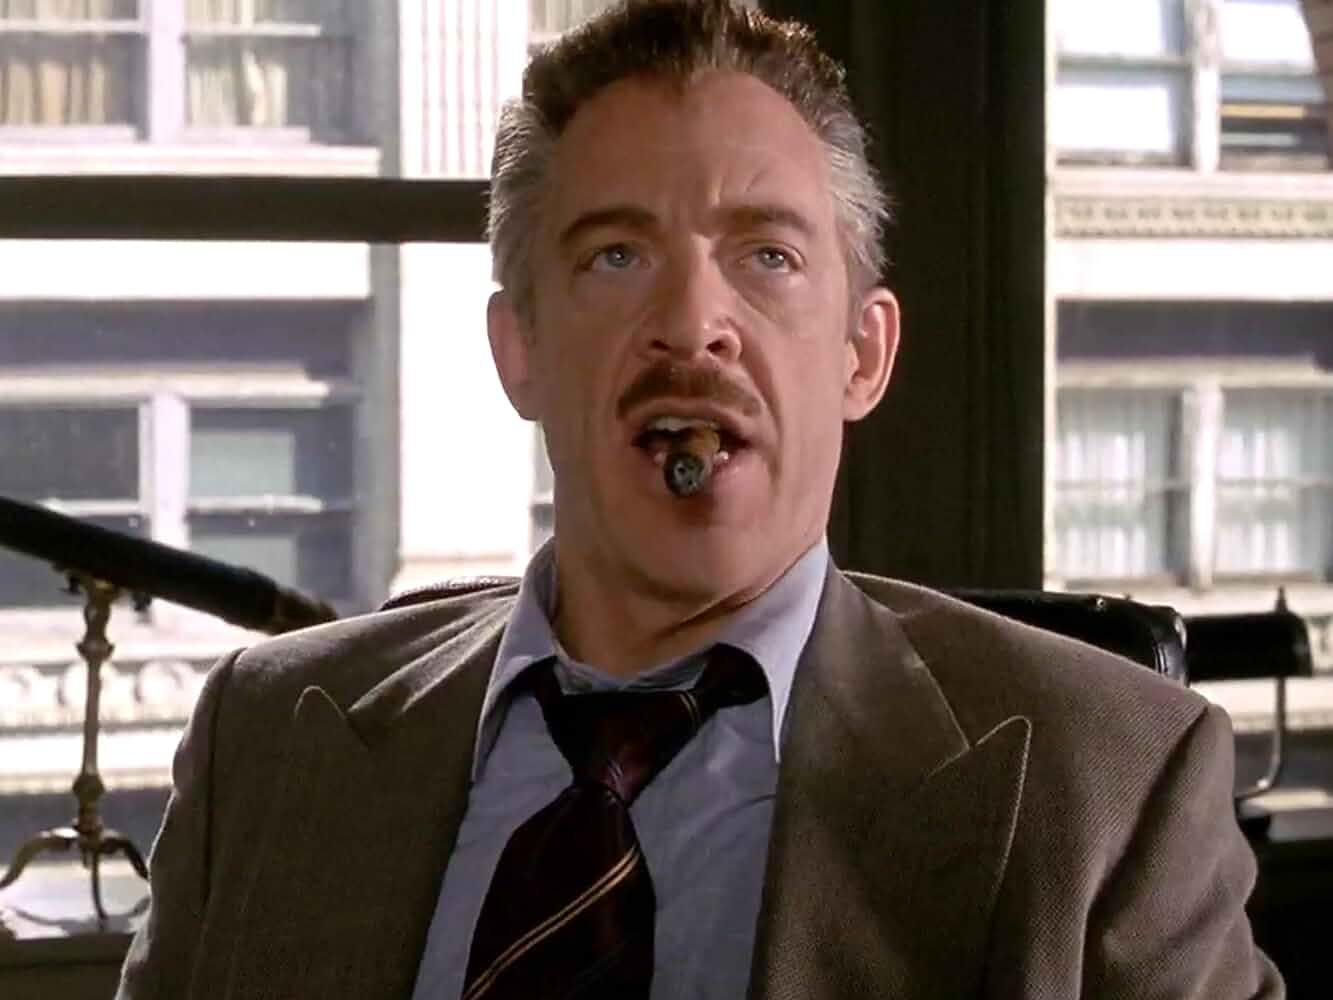 JK Simmons in Spider-Man 2002